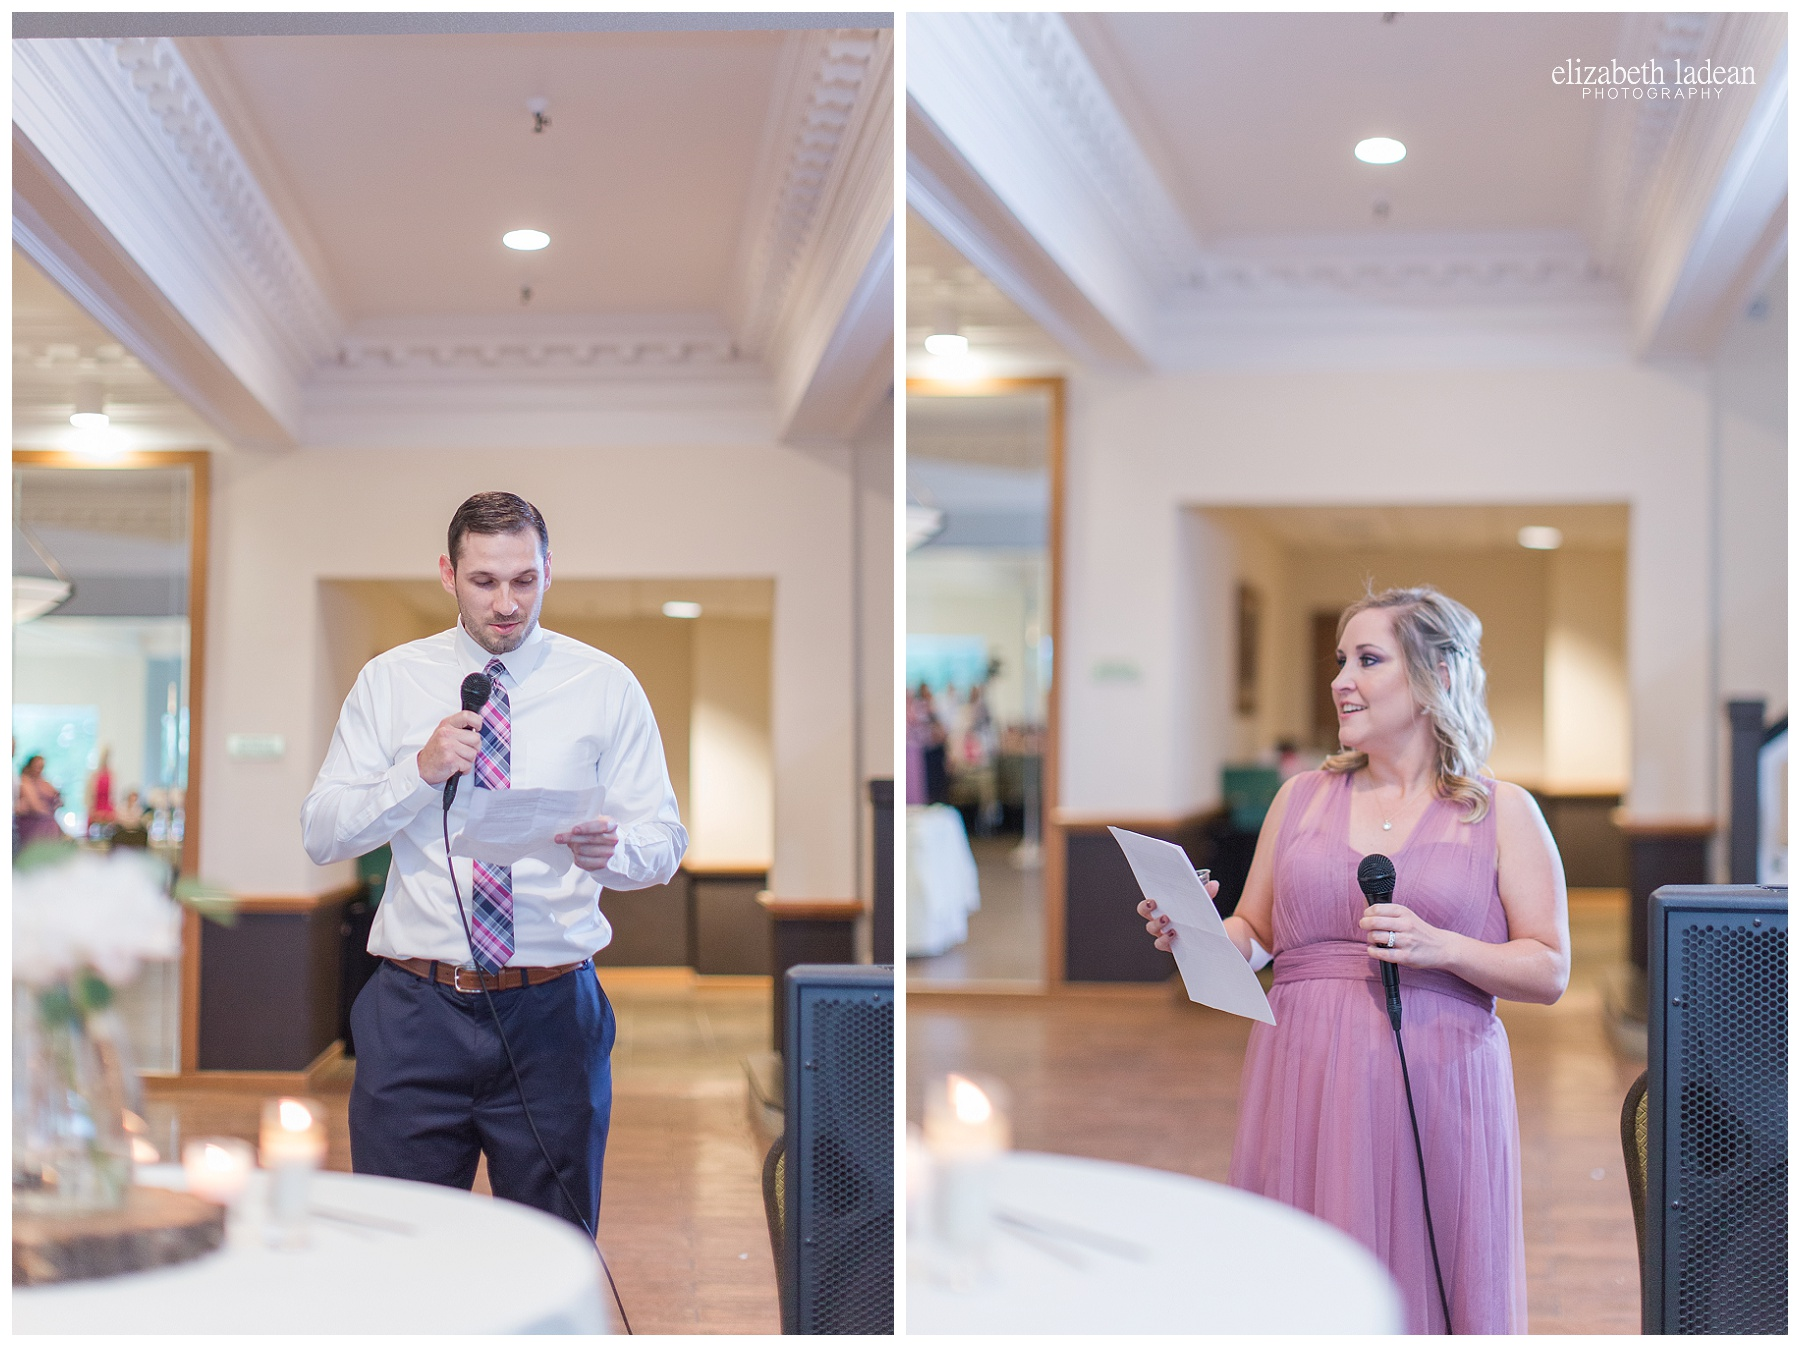 Hillcrest-Country-Club-Kansas-City-Wedding-Photography-E+J-0520-Elizabeth-Ladean-Photography-photo_0877.jpg